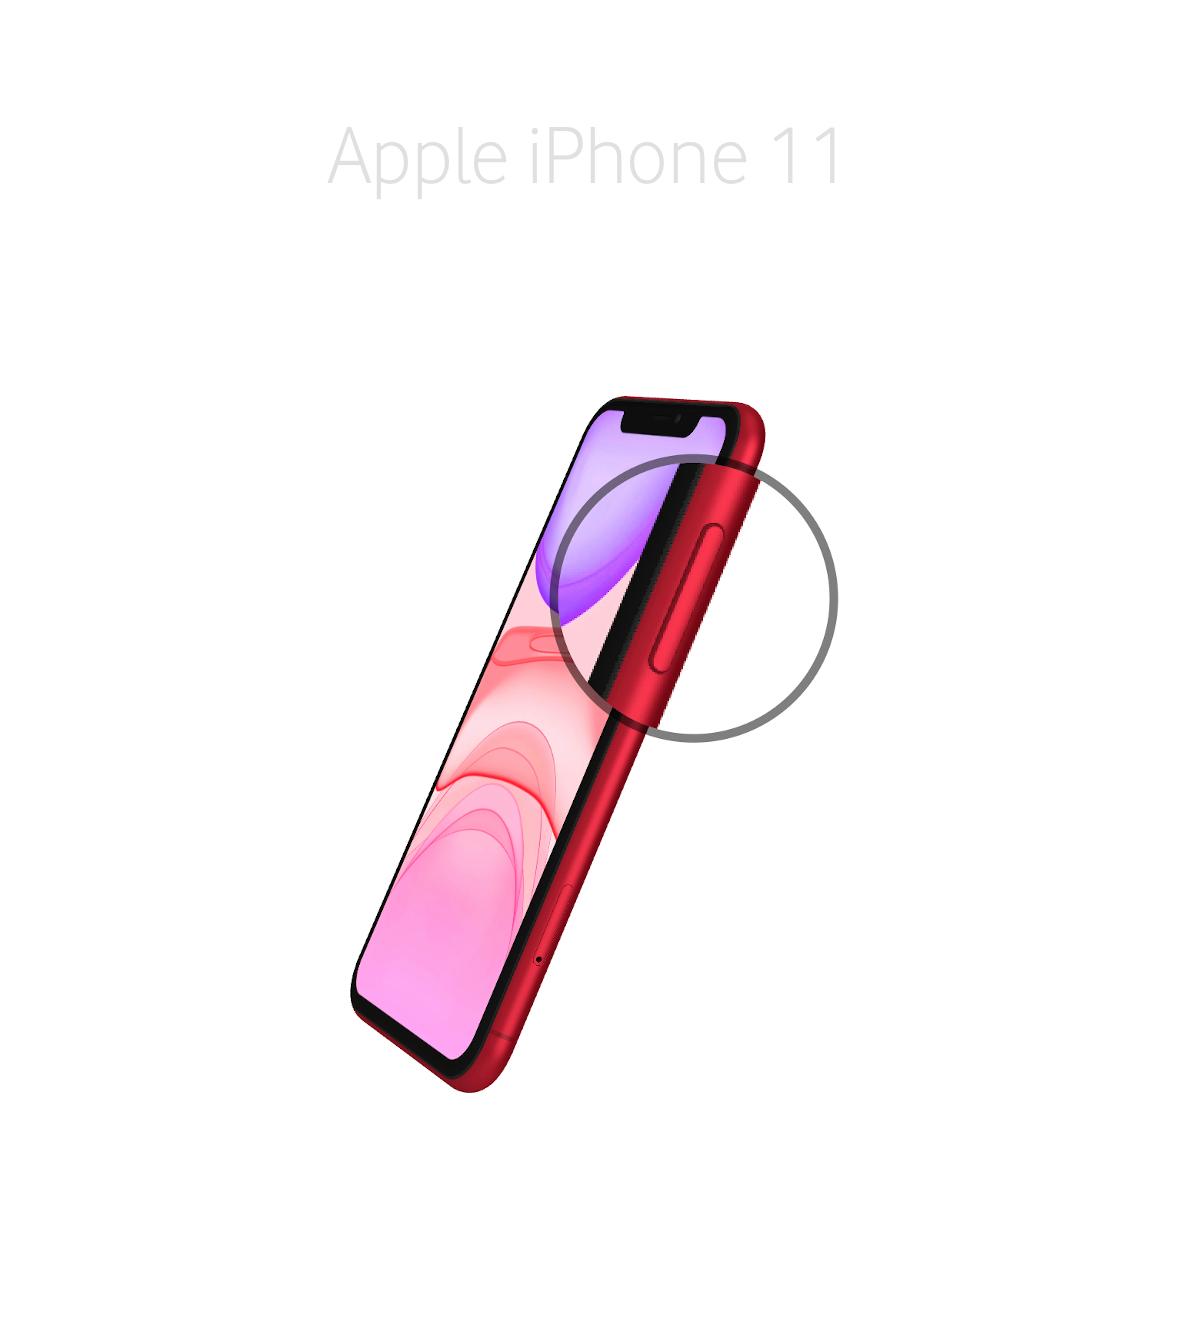 Laga onoff knapp iPhone 11